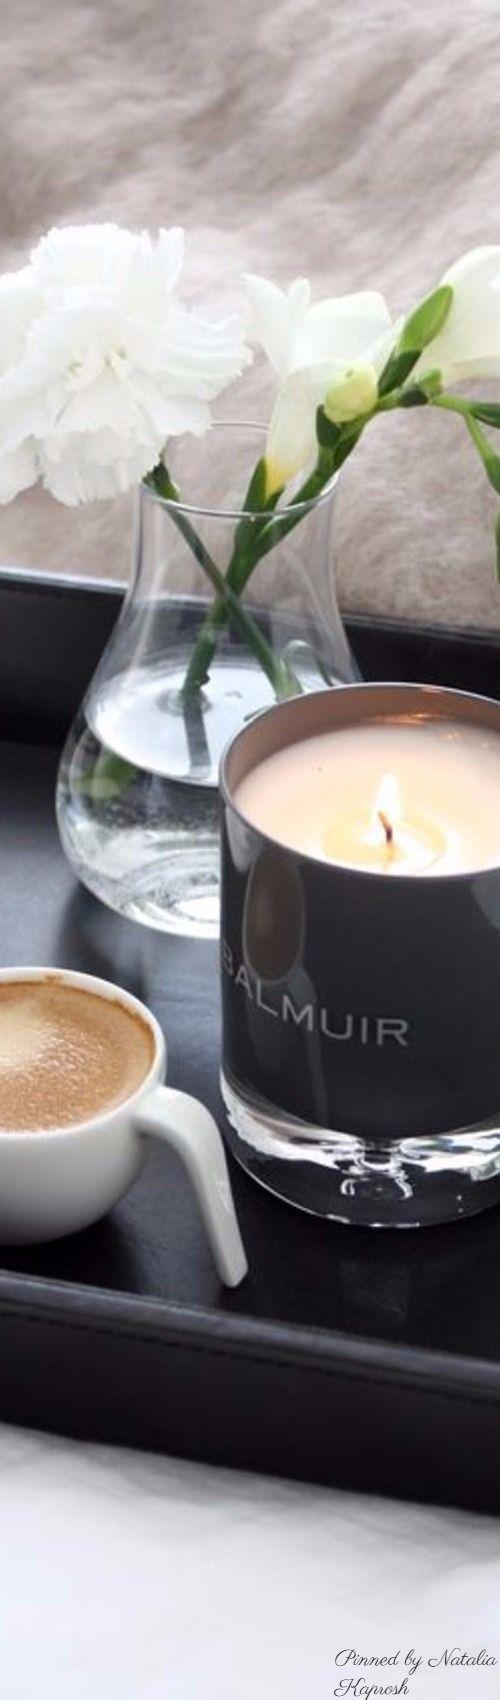 Pin by natalia kaprosh on tastes of life pinterest coffee